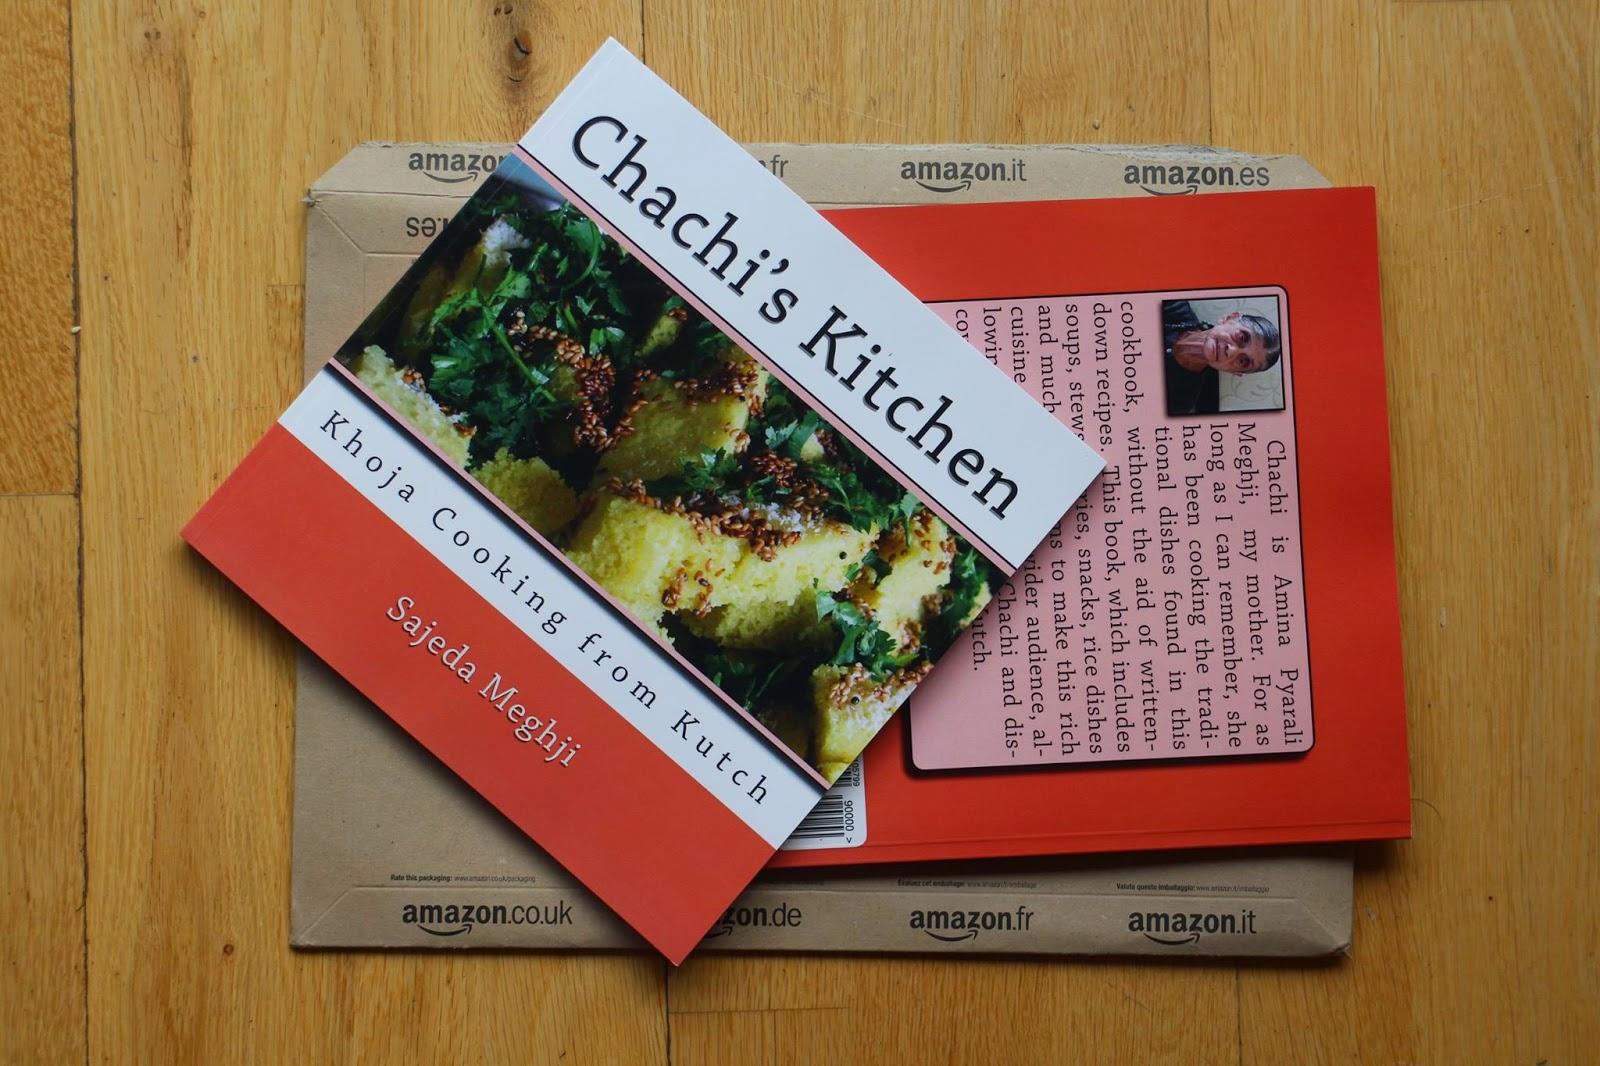 Chachi's Kitchen Cookbook